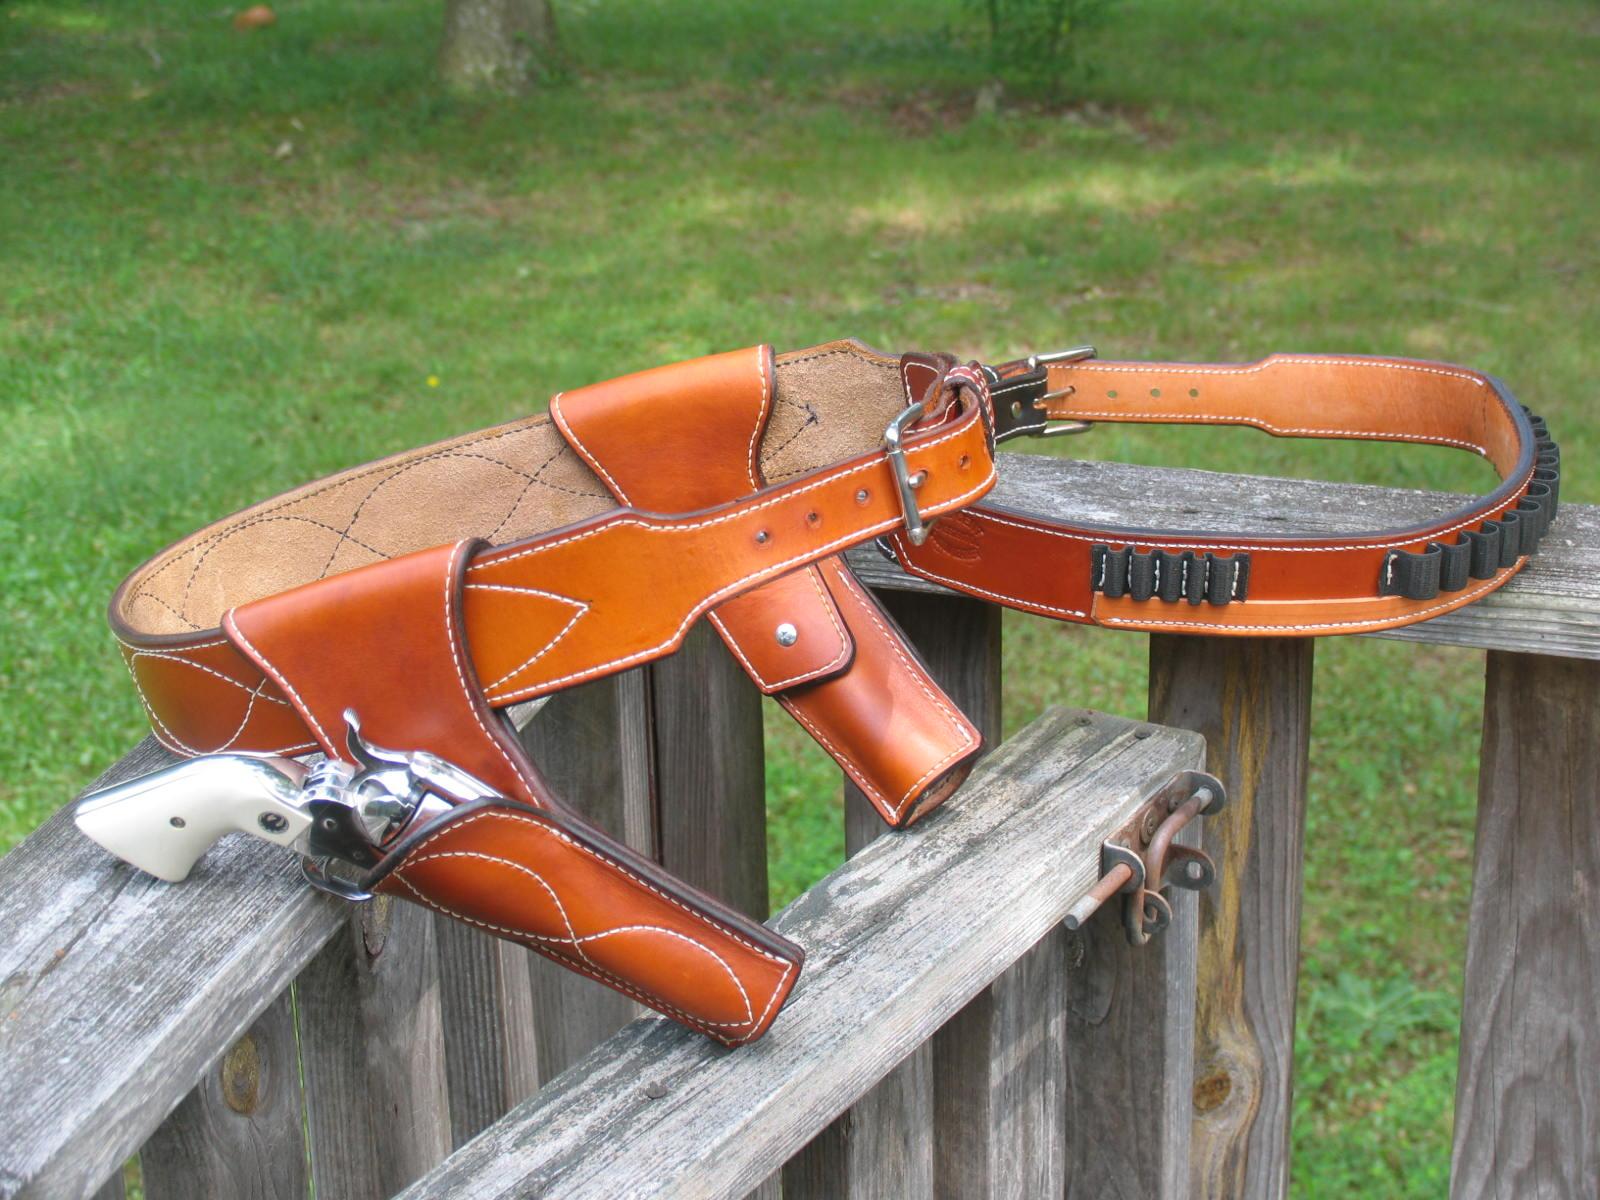 Helloooooooo - Gun Holsters, Rifle Slings and Knife Sheathes